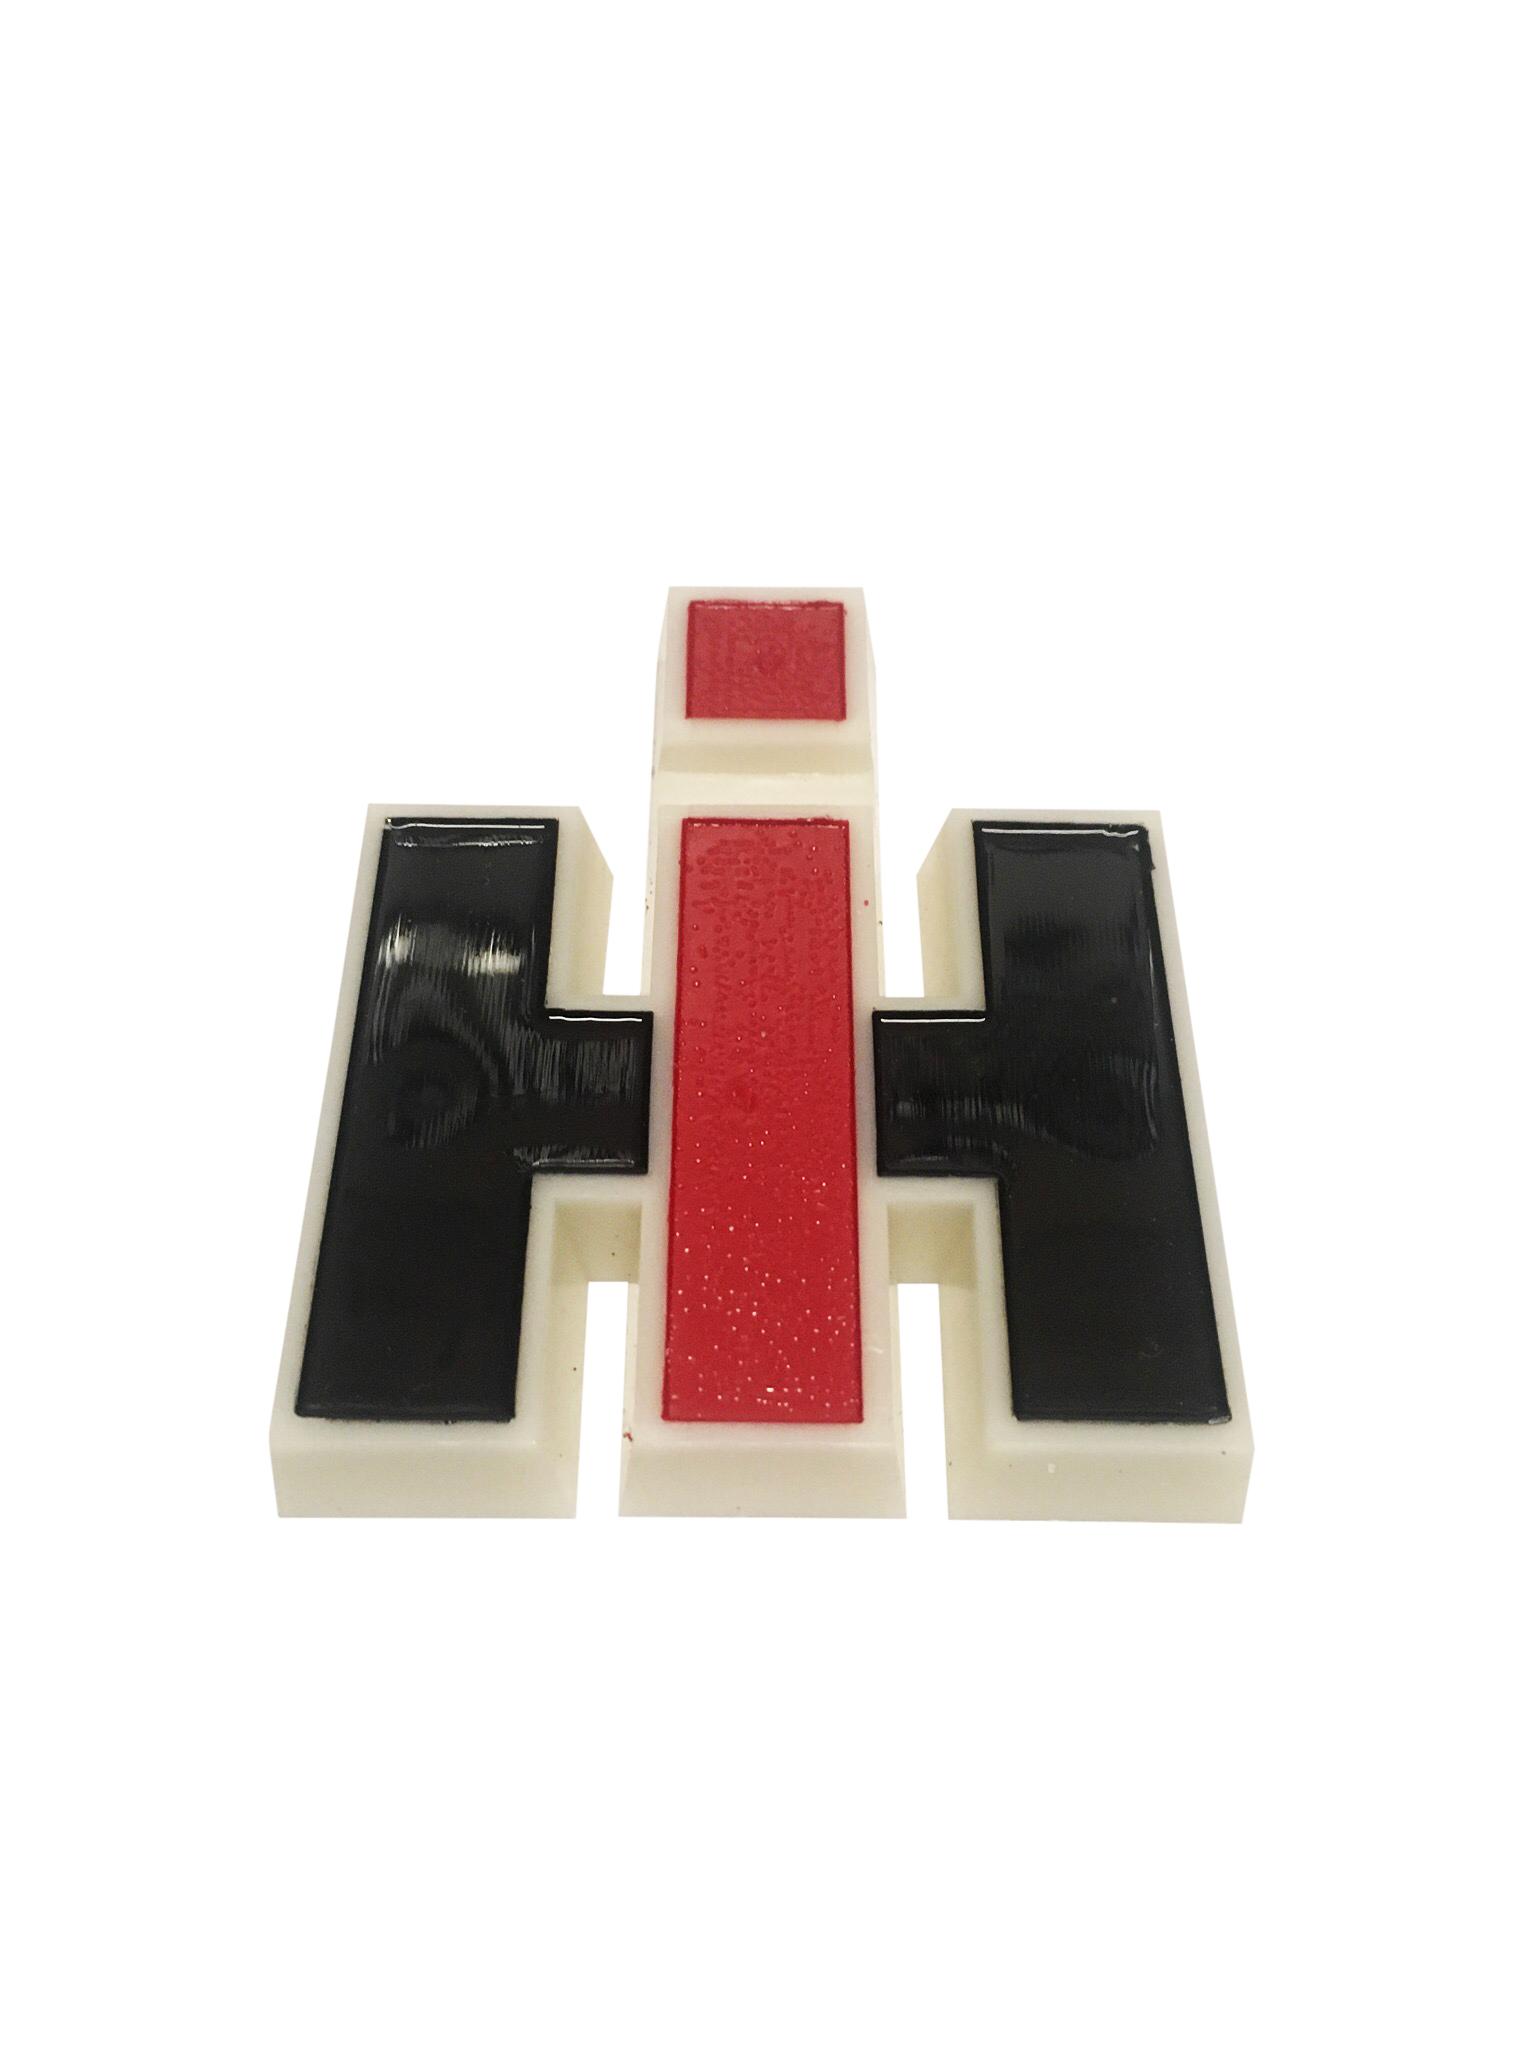 Emblem 120397C1 * Logo Firmenlogo weiss für Case IHC 323-1246  Vergl.nr